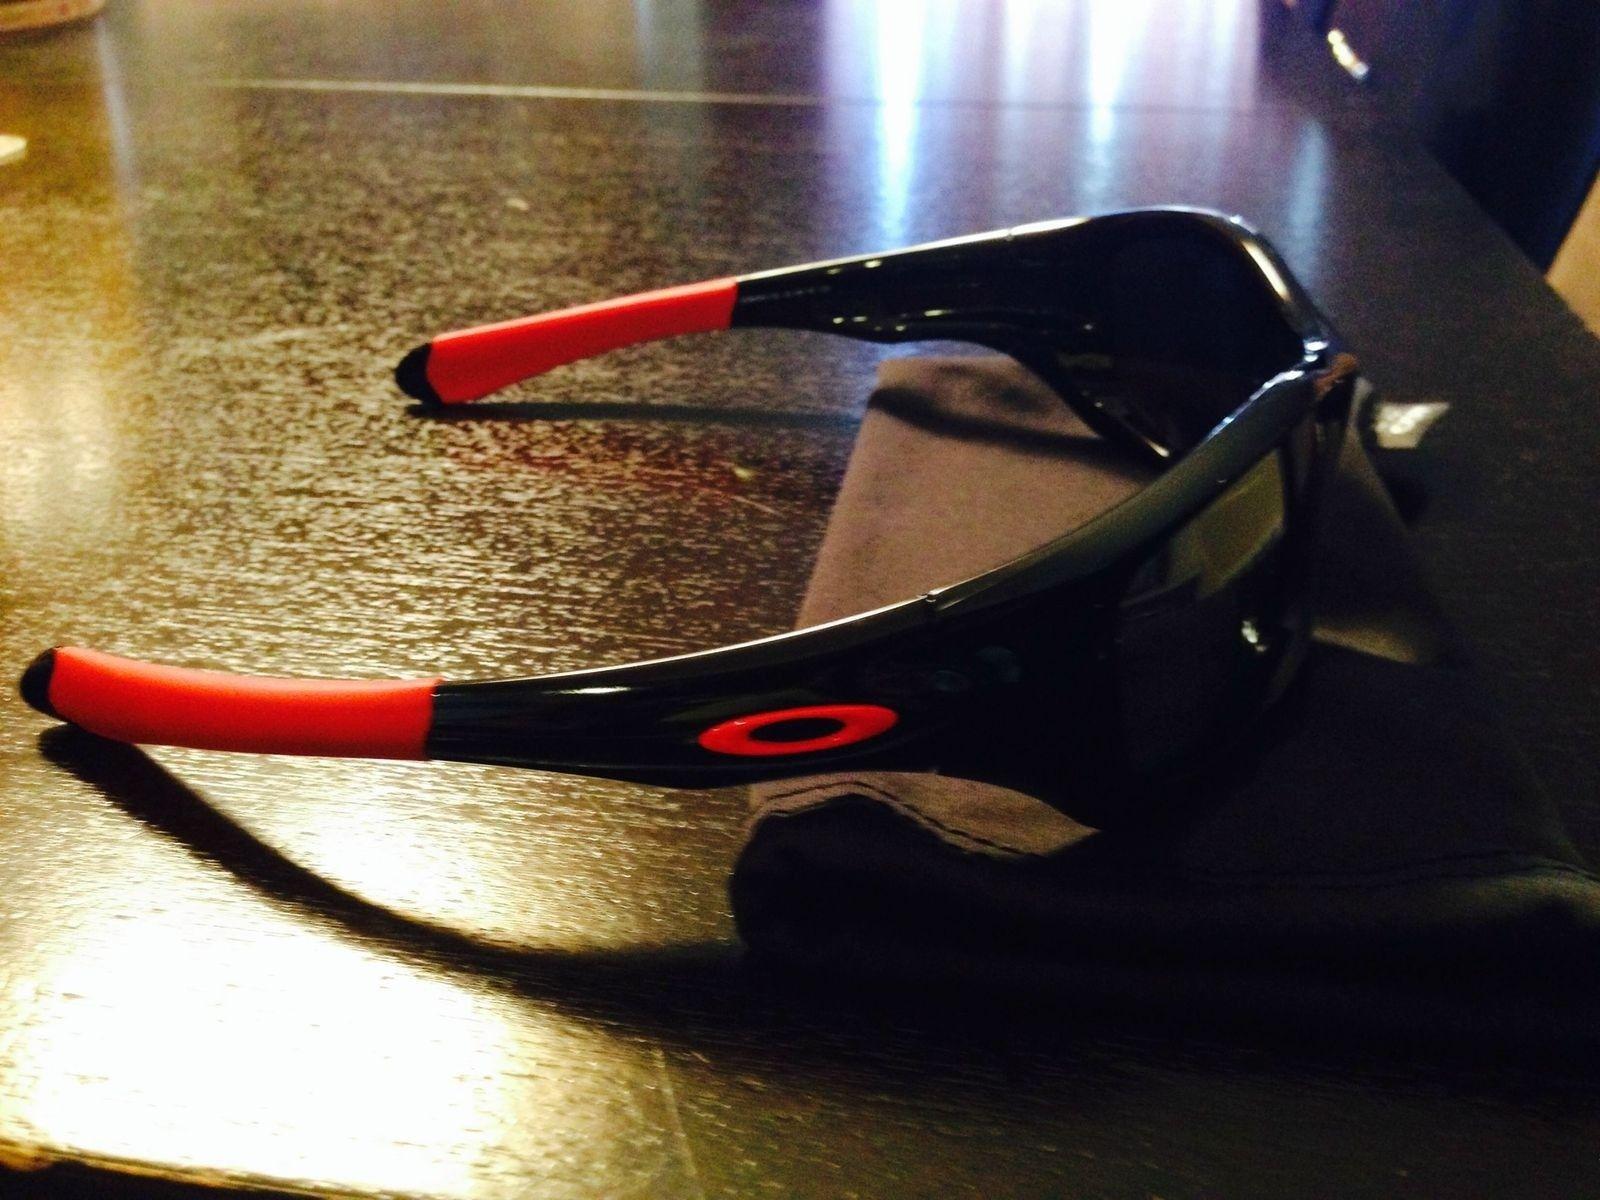 Ducati Pitbull (Updated W/ Pics & I Now Have A Ducati Bag) - gr8VQVd.jpg